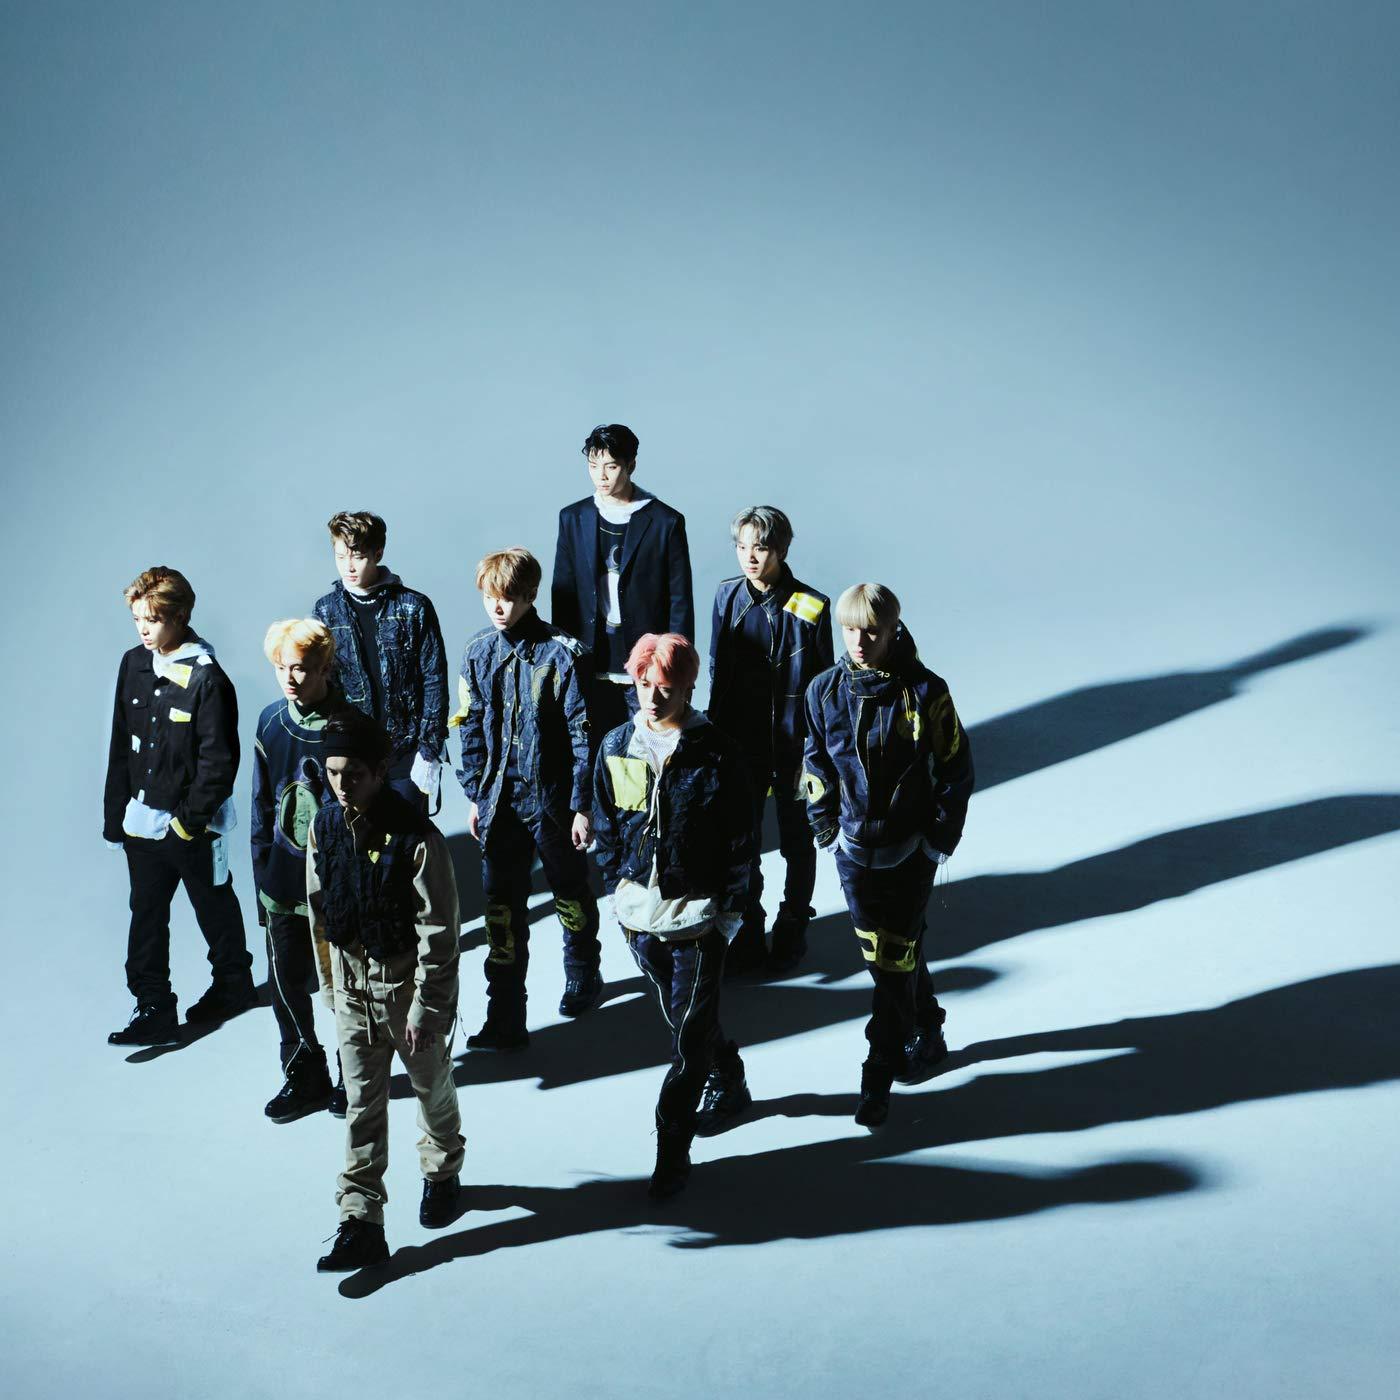 YUTA OFFICIAL ALBUM PHOTOCARD Circle Nct #127 We Are Superhuman The 4th Mini